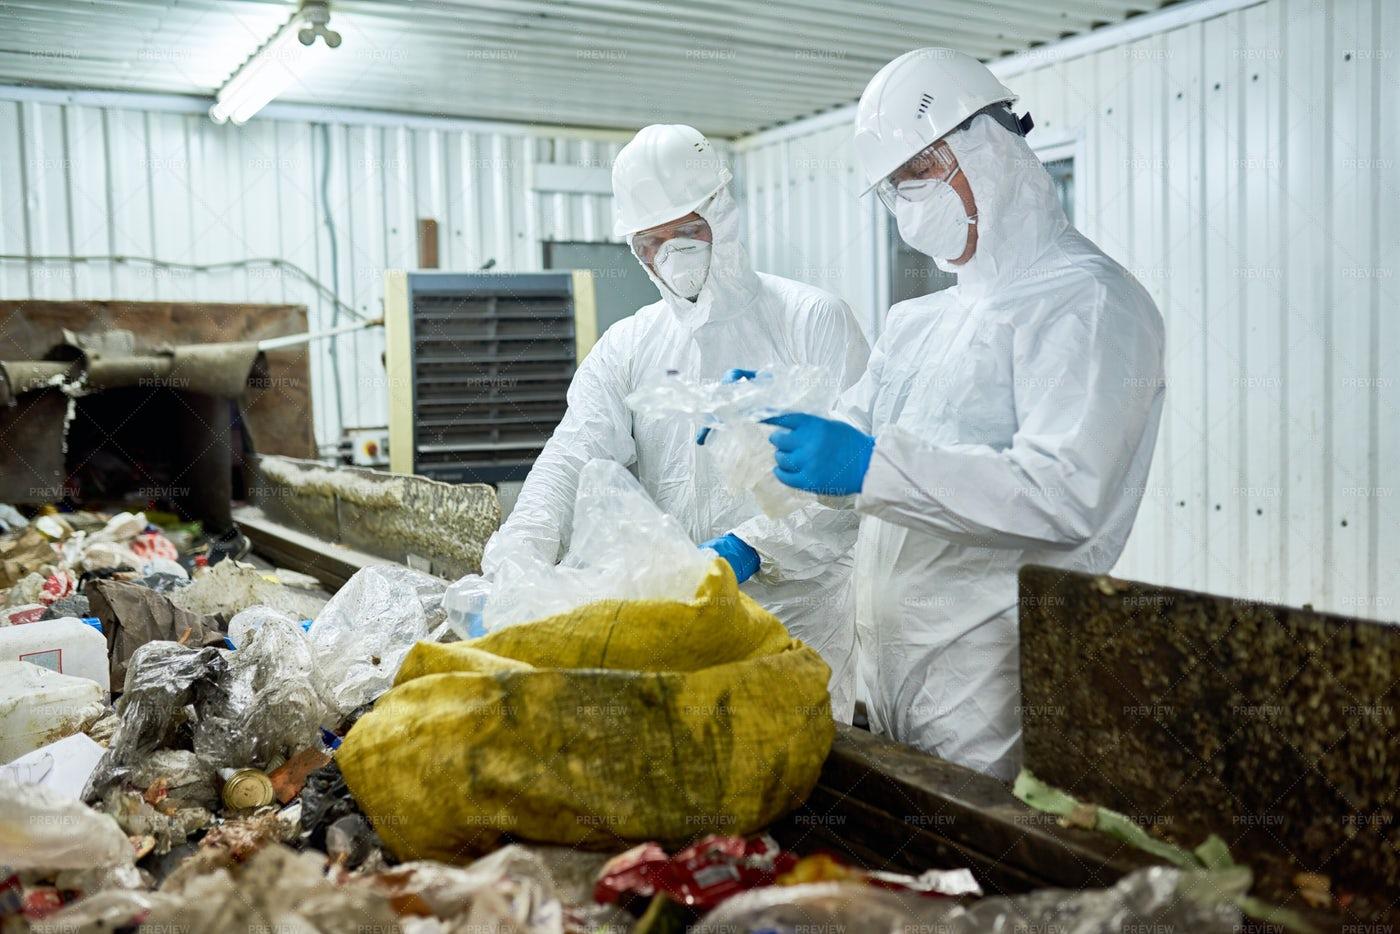 Workers Sorting Trash On Conveyor...: Stock Photos